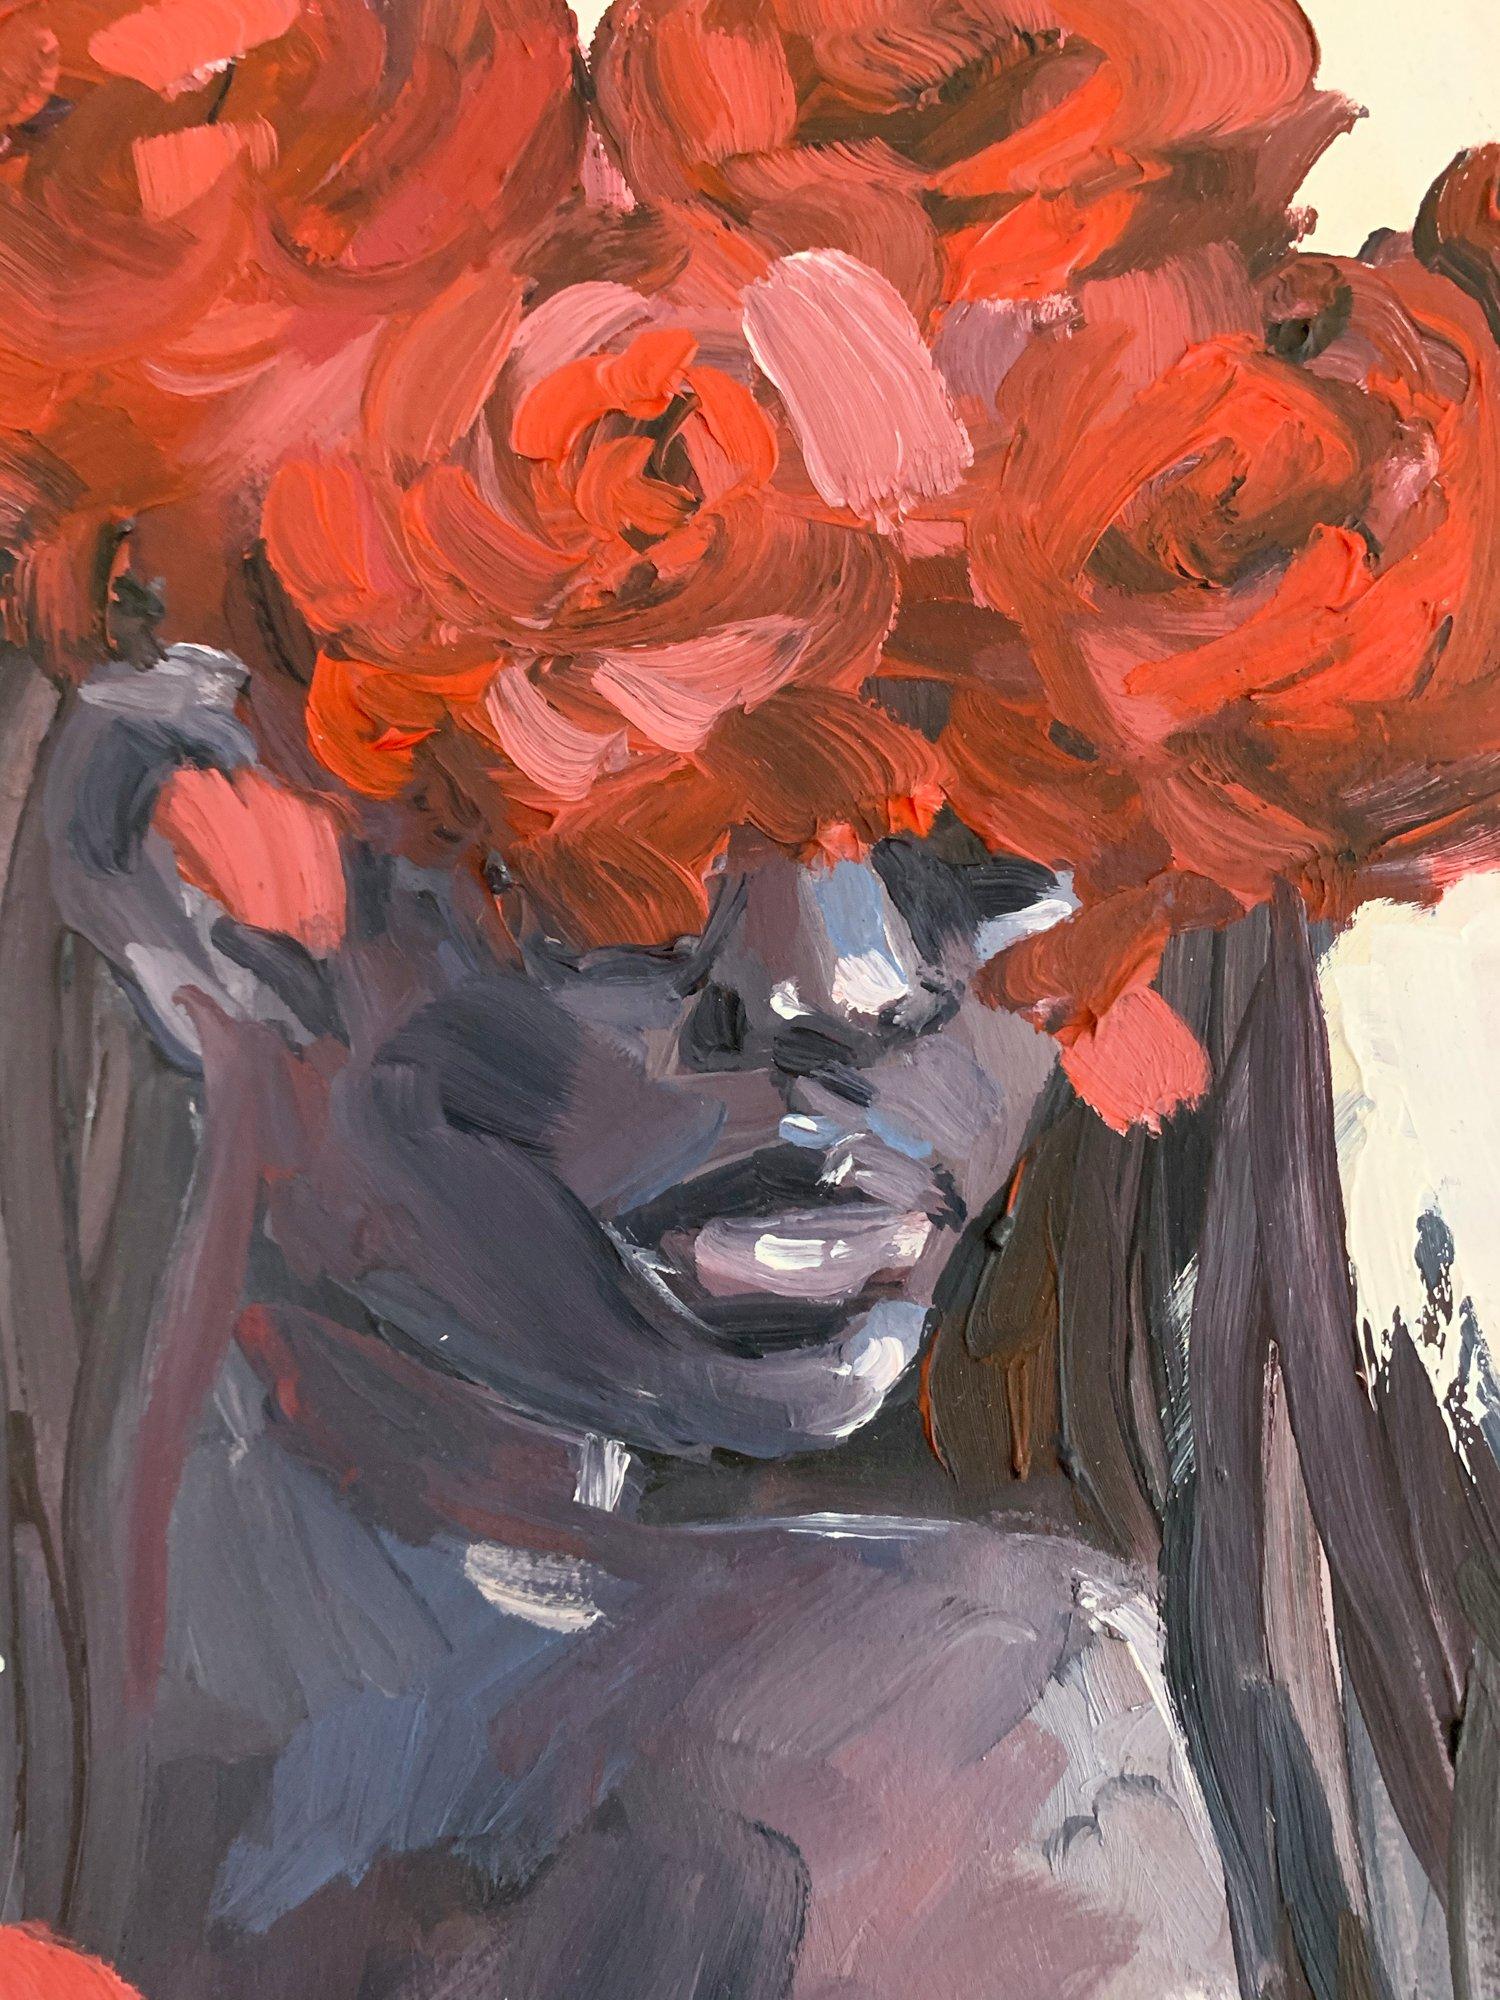 Agnes-Cecile the scent - sketch